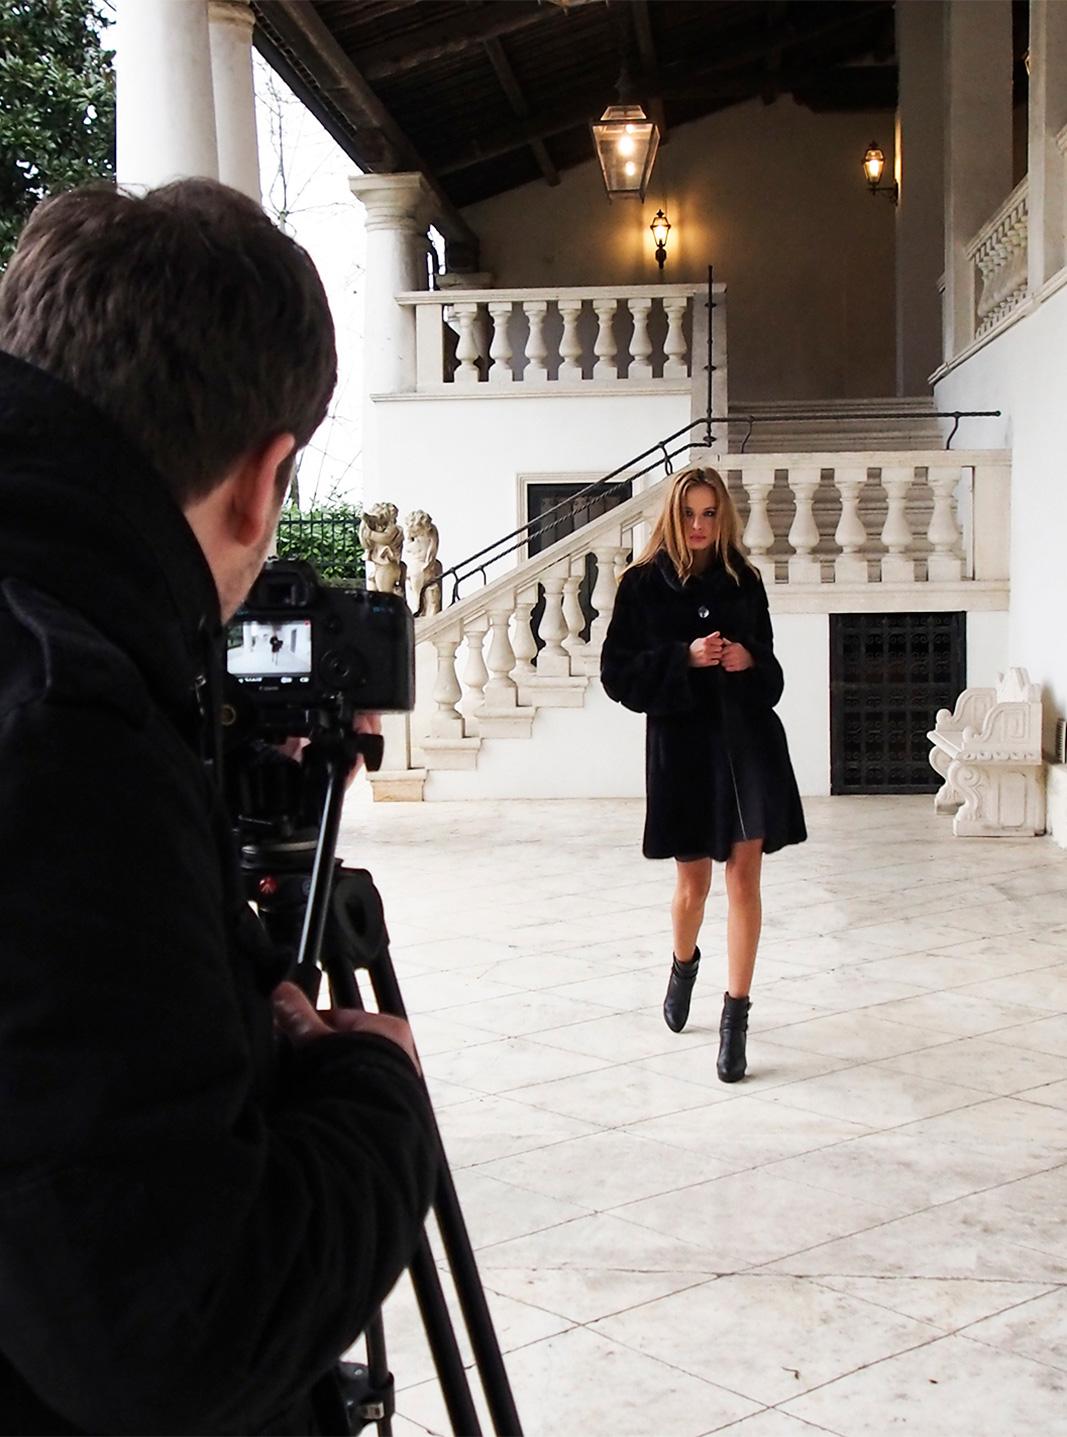 villa per shooting Vicenza, spazio esterno per shooting Vicenza, spazio esterno per shooting Padova, villa per shooting Vicenza